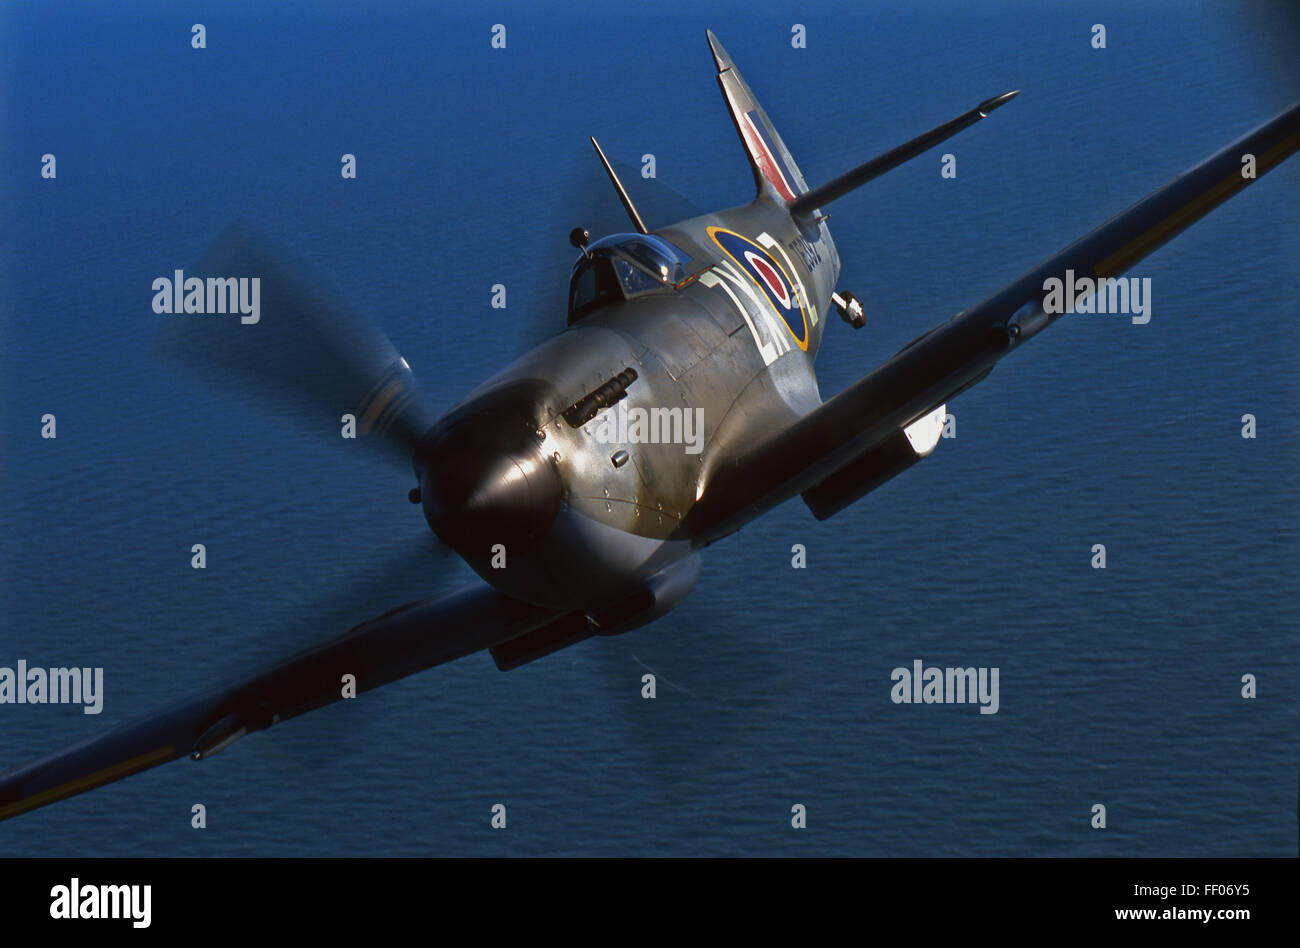 WWII Supermarine Spitfire airplane - Stock Image